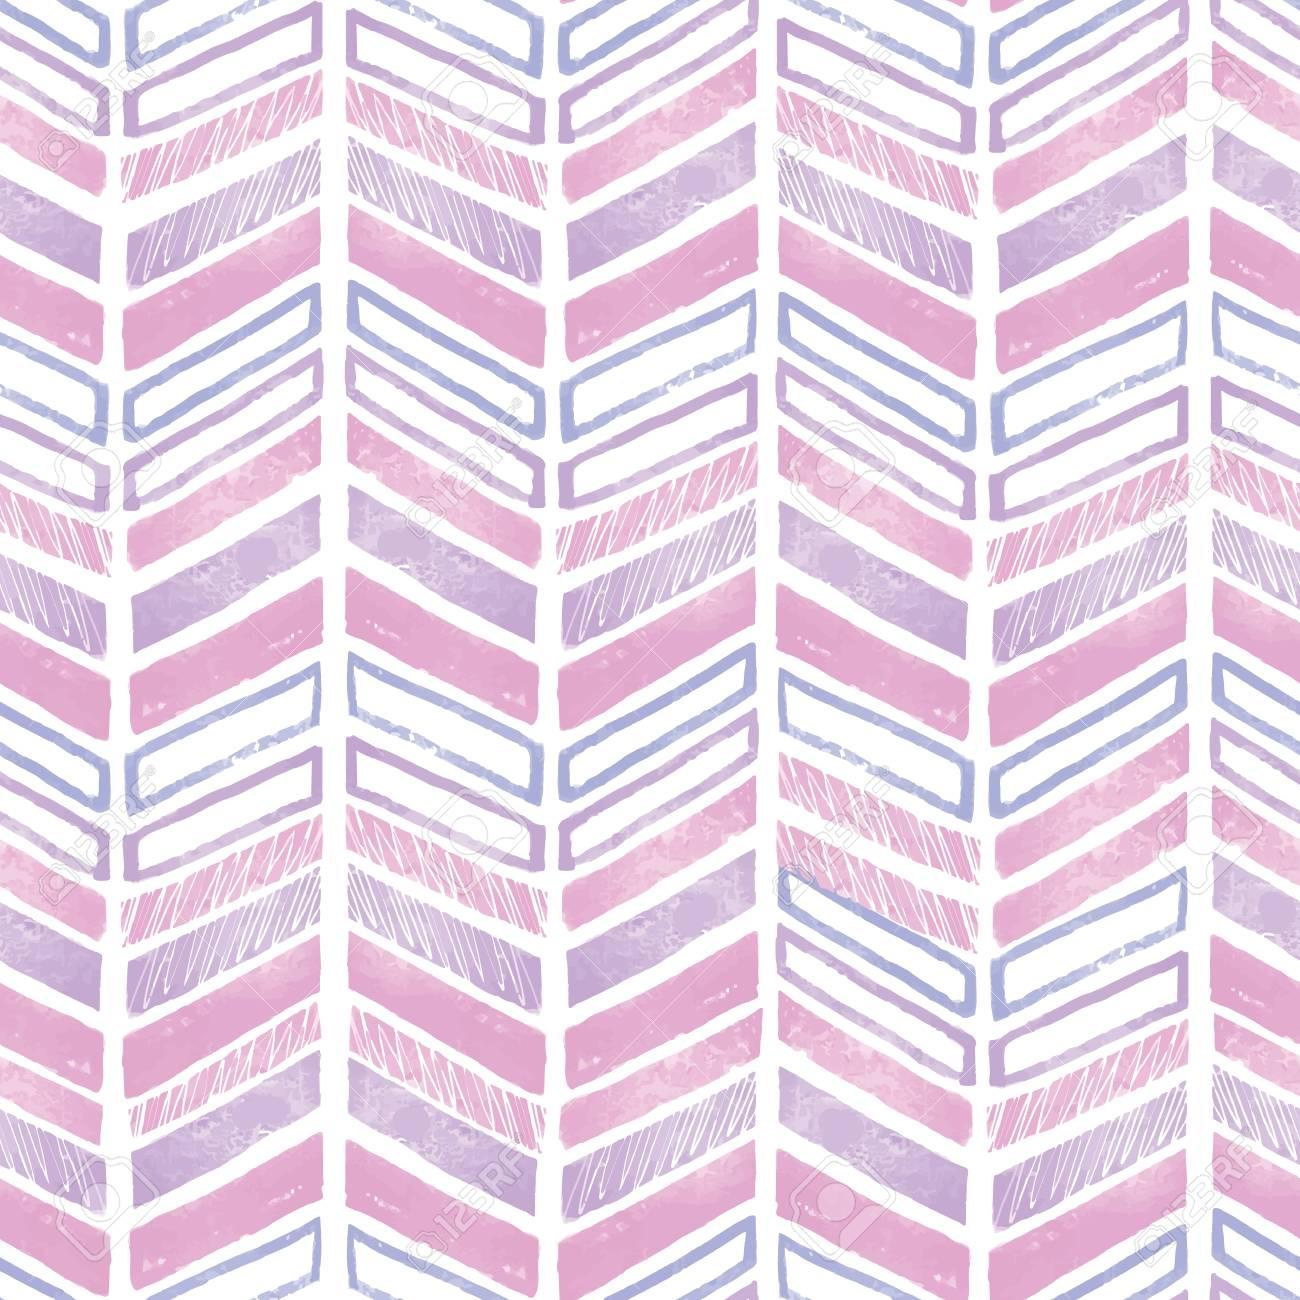 Purple Pink Tribal Chevron Repeat Pattern Design Great For Folk